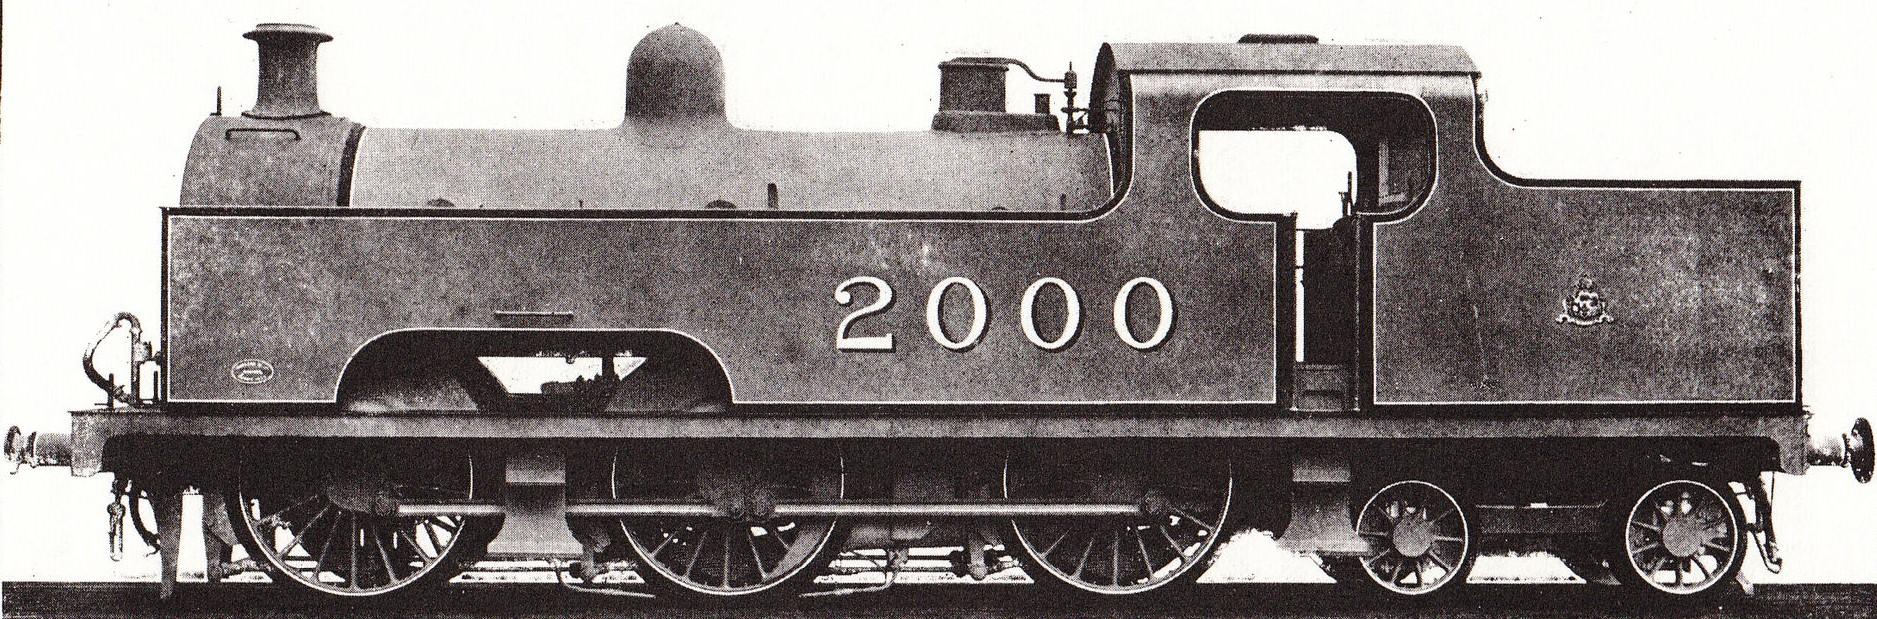 2000 - Midland Railway works photograph. ©Public Domain